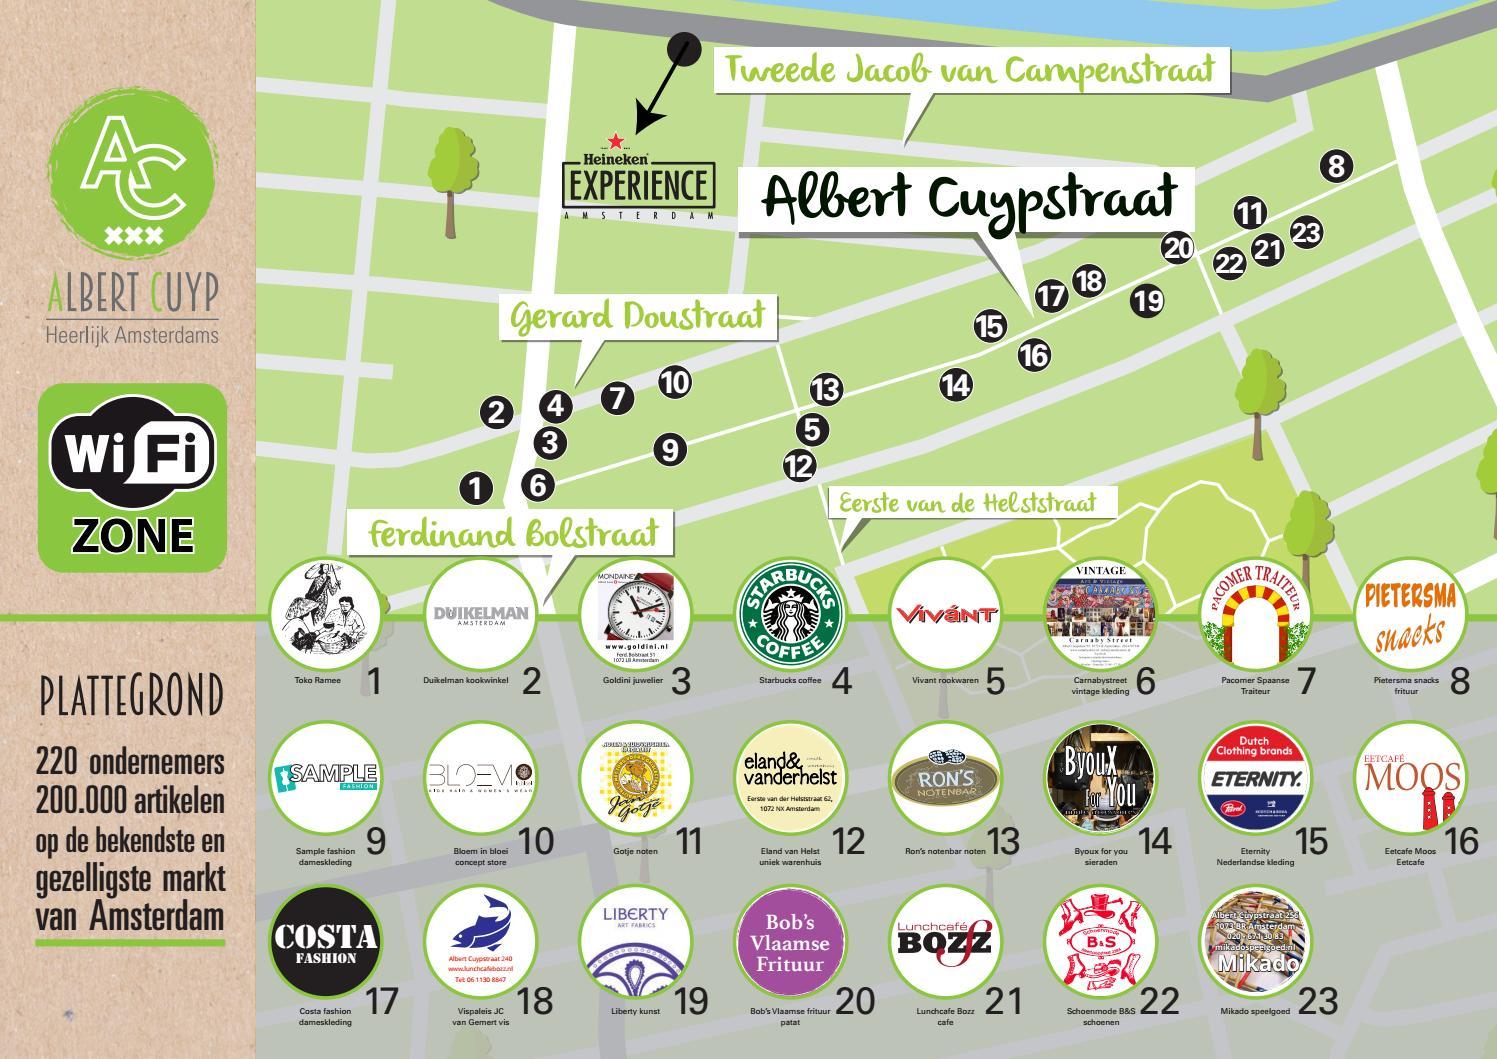 Plattegrond Albert Cuypmarkt by demediagroep - issuu